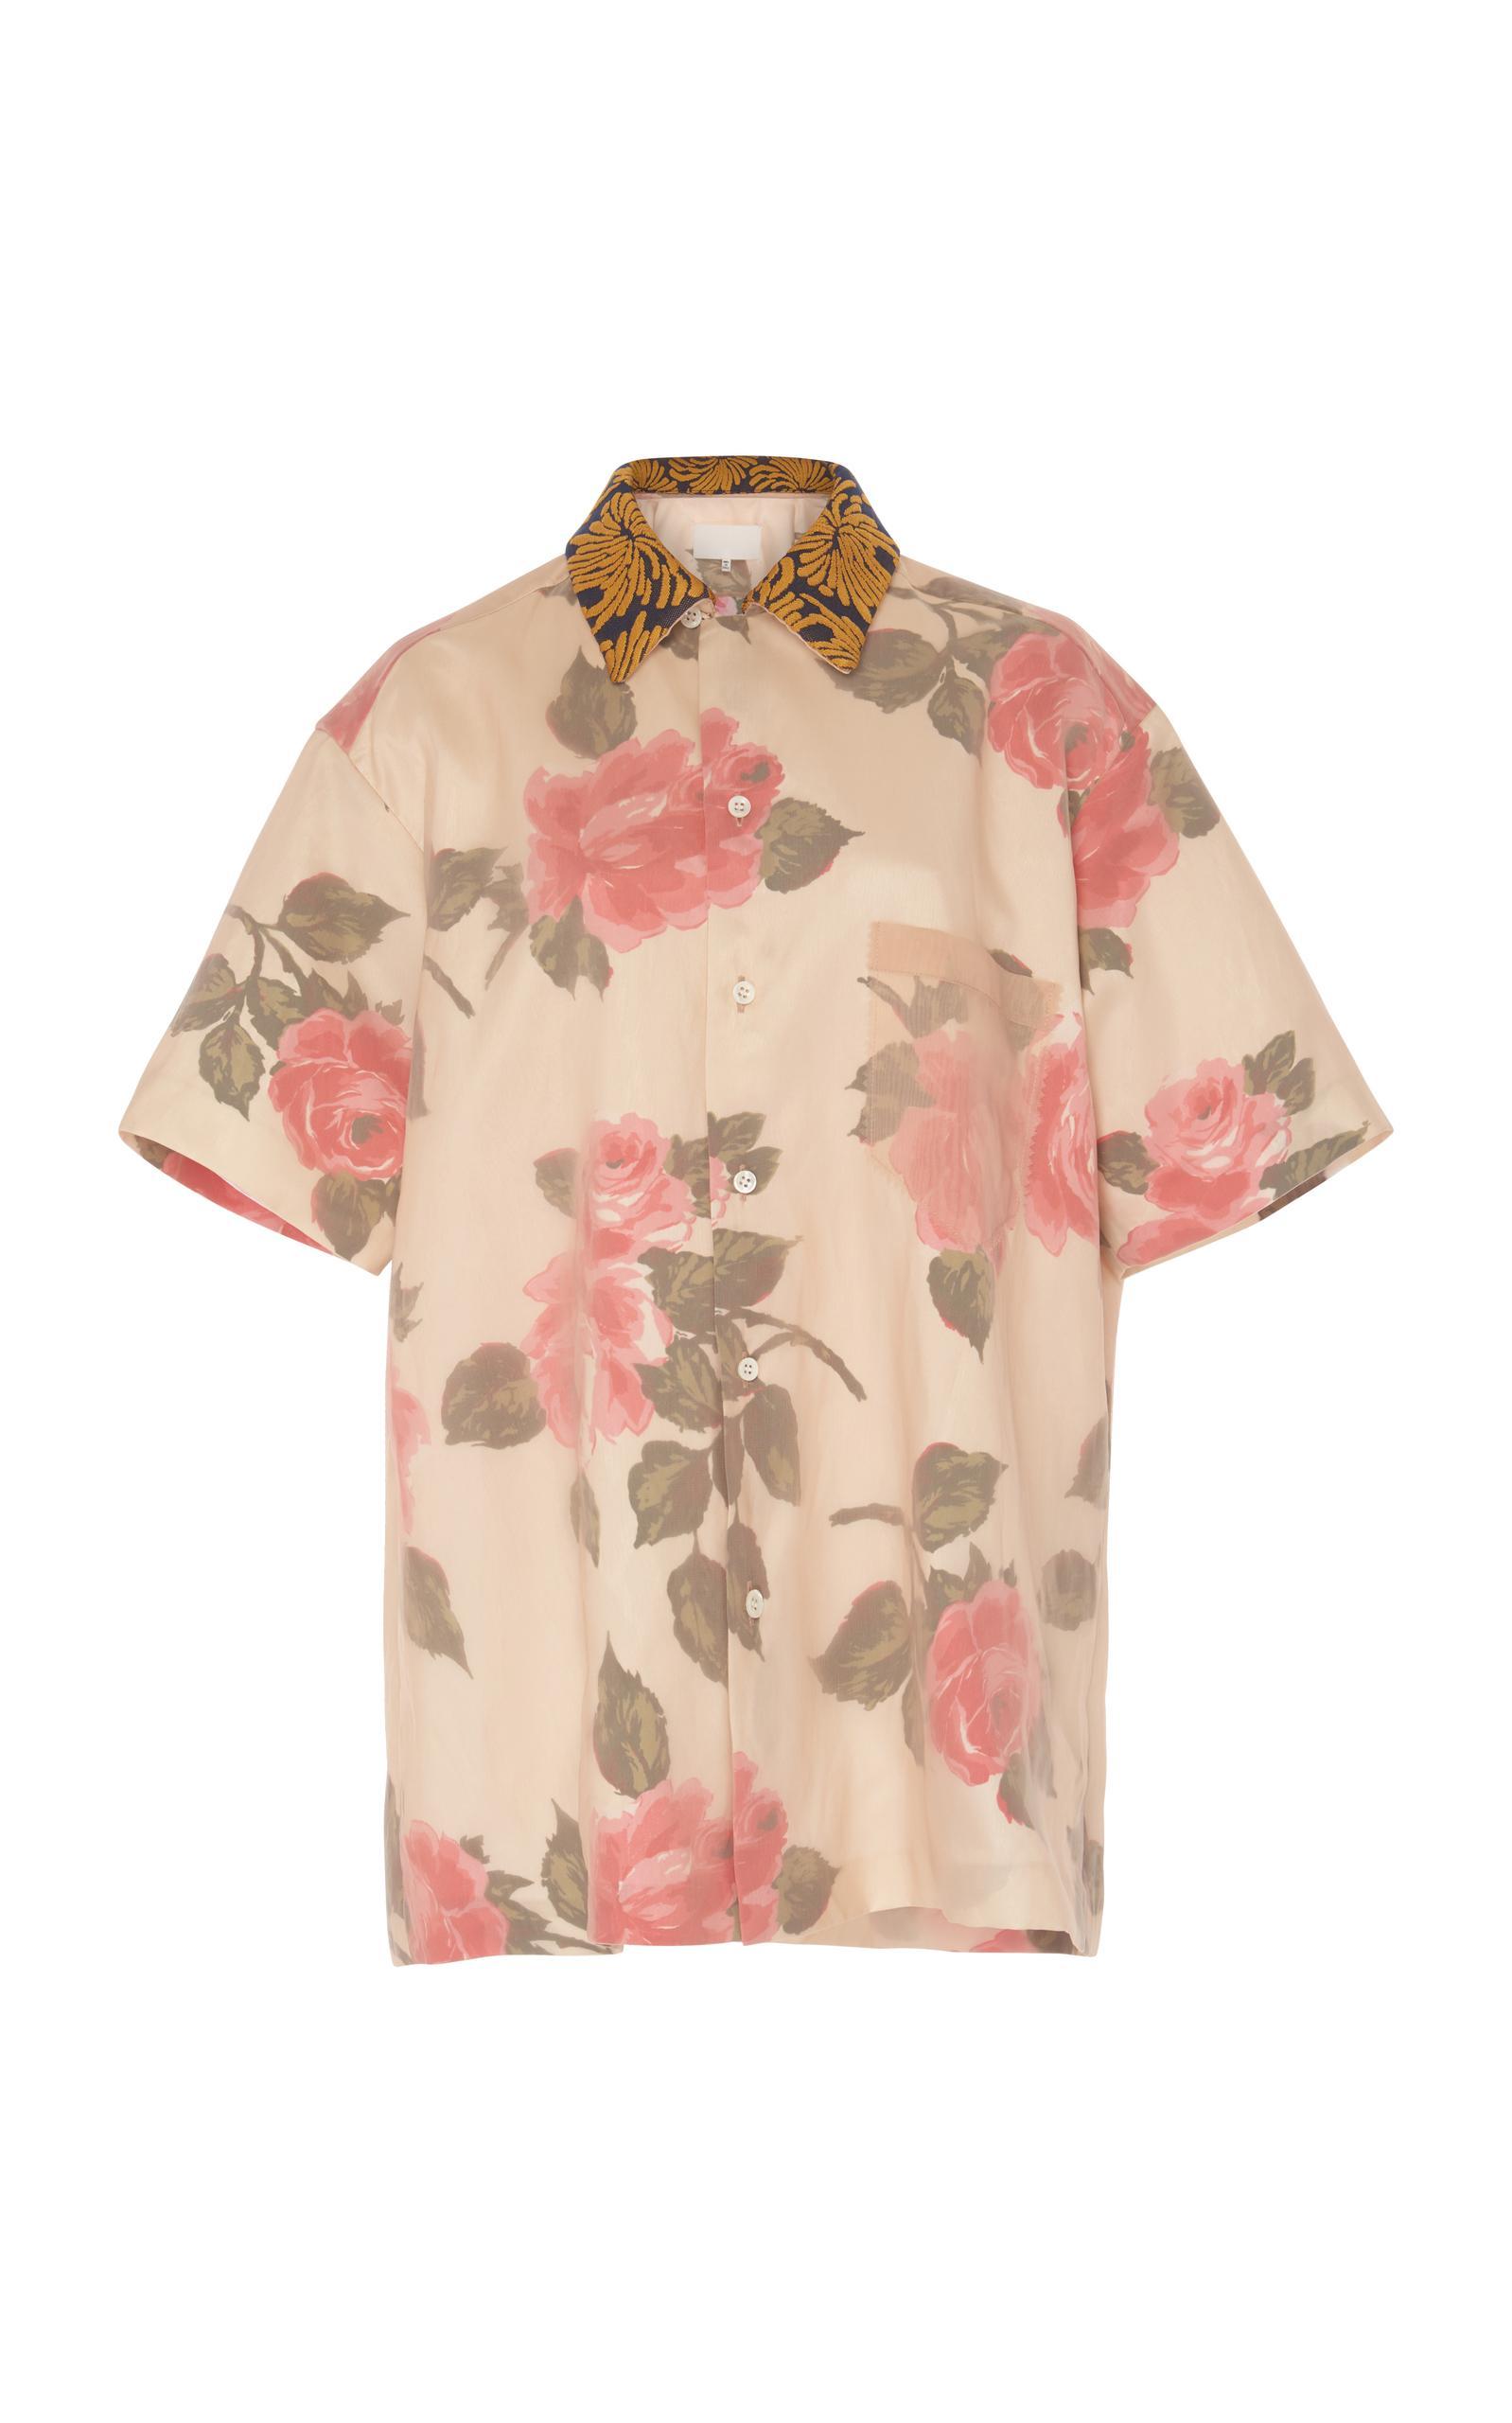 Maison Margiela Cut Out Floral Shirt In Multi